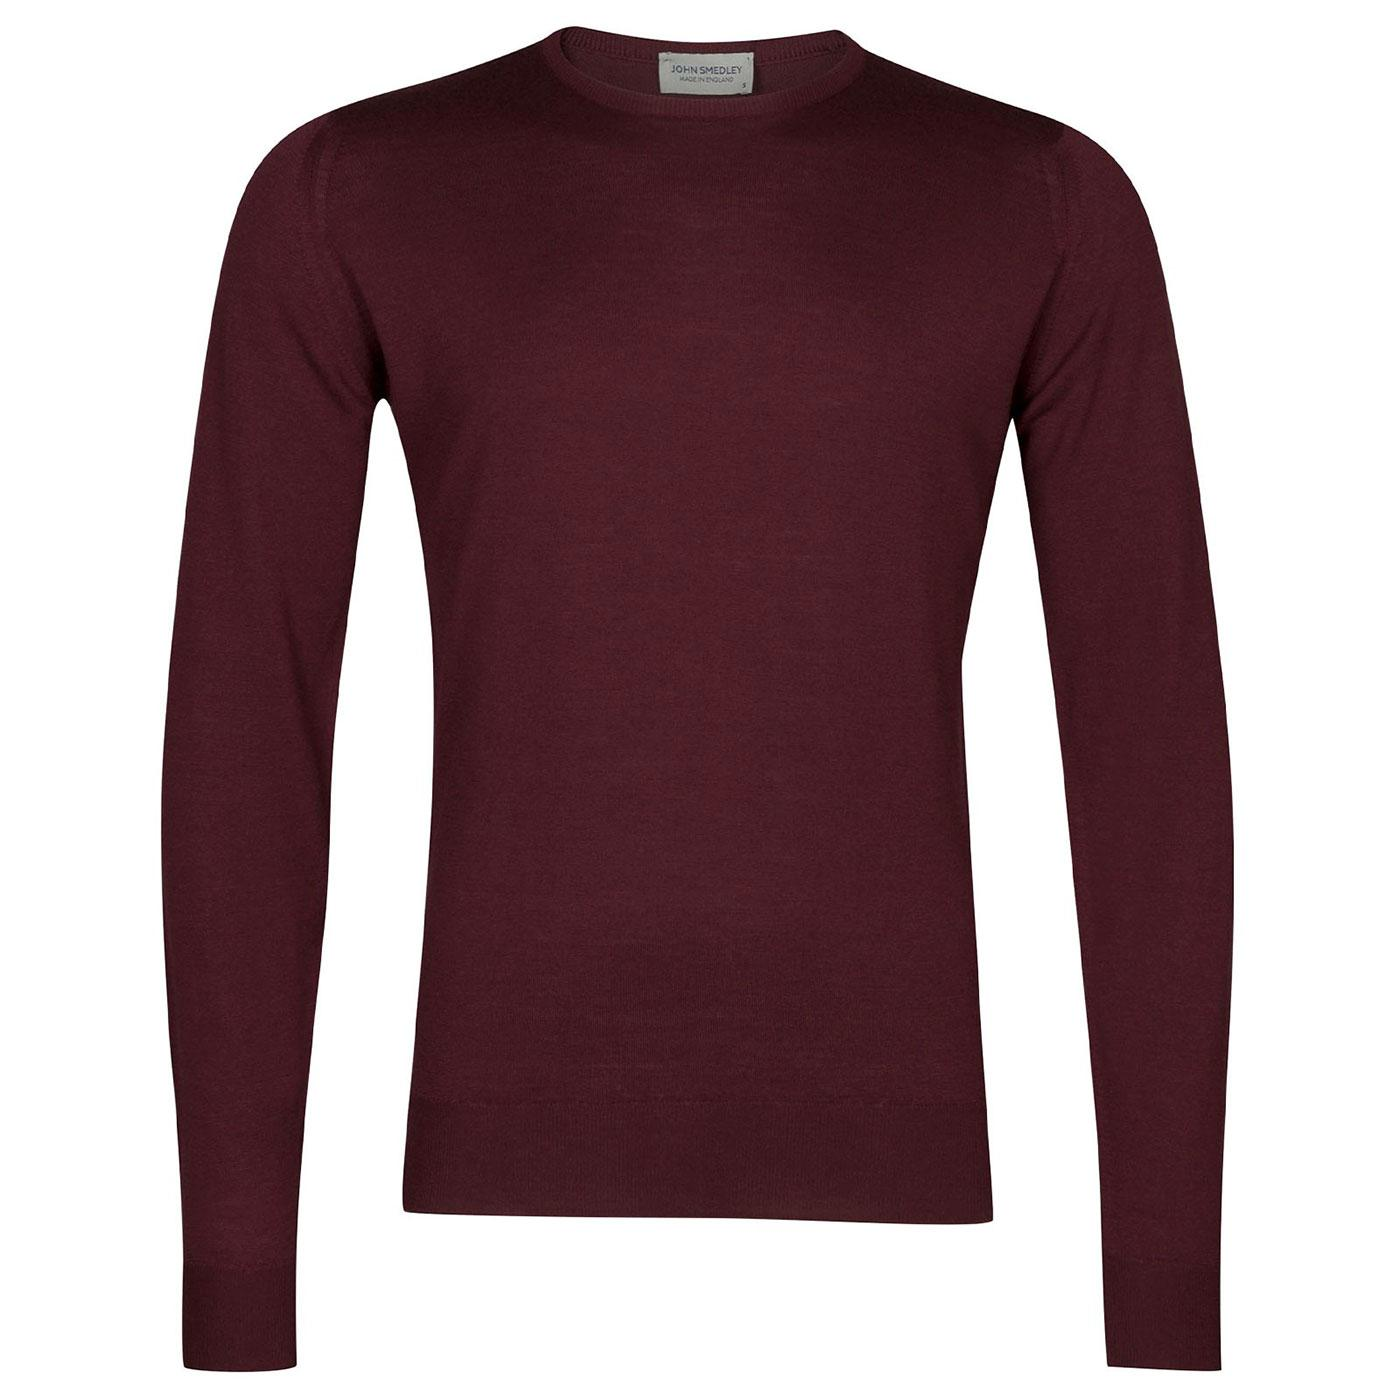 Lundy JOHN SMEDLEY Knitted Merino Wool Pullover BO